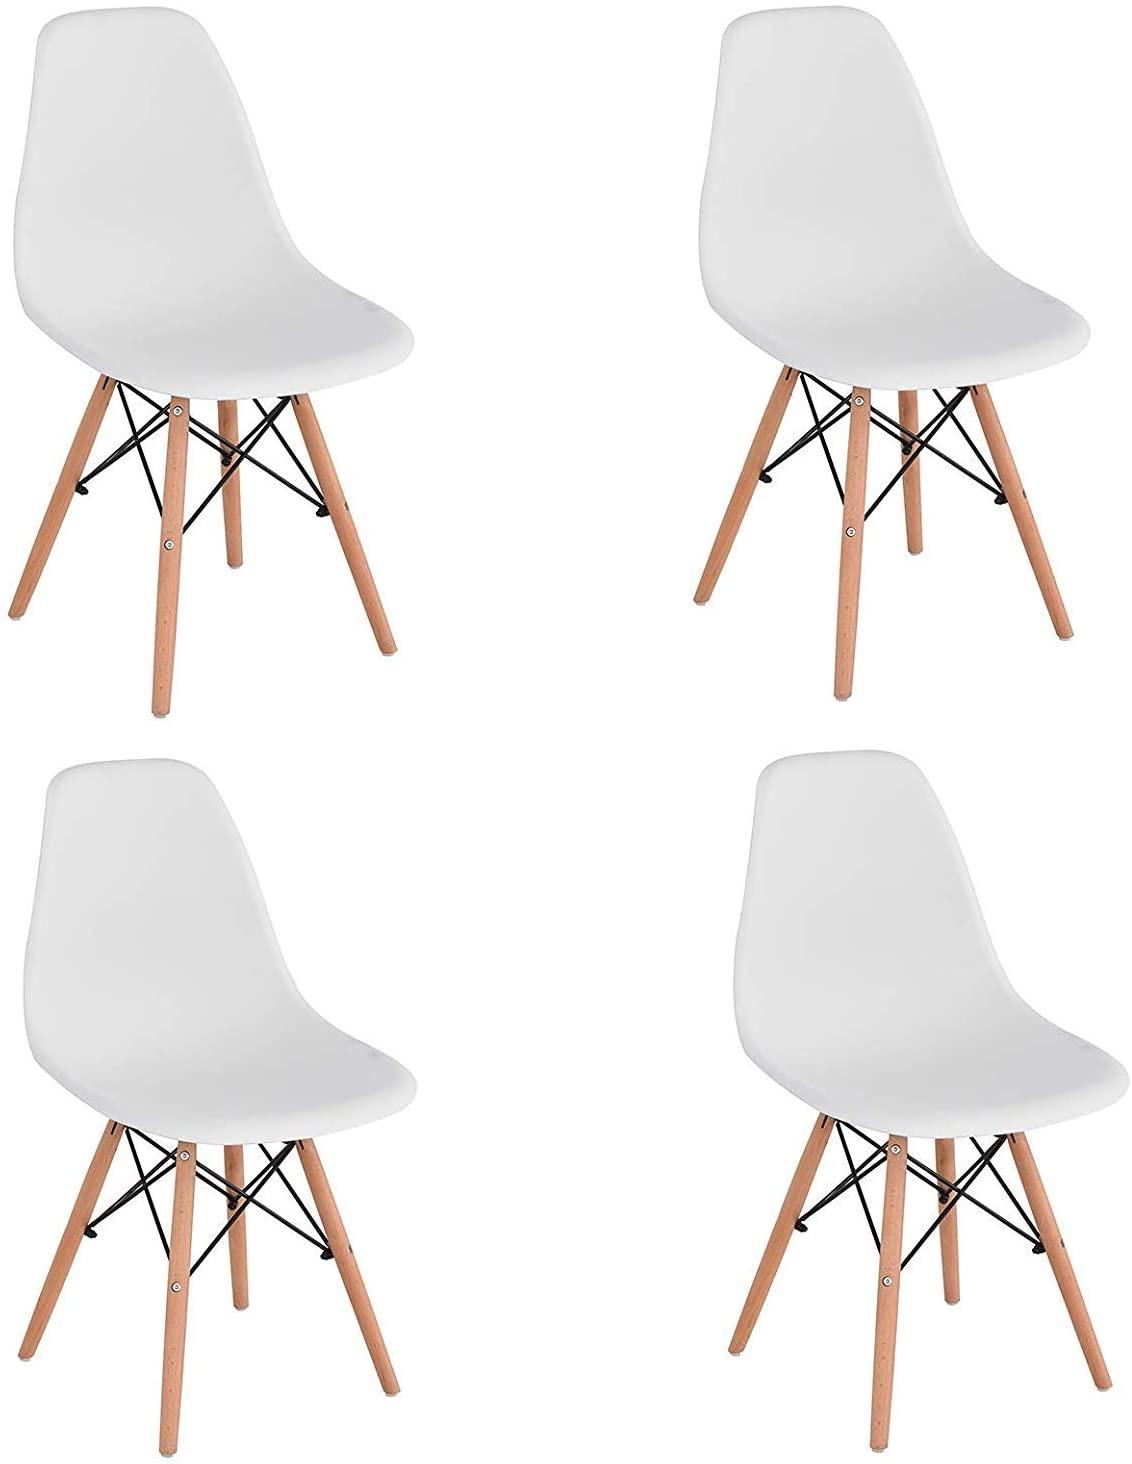 KunstDesign Silla de Comedor Premontada, Silla de Comedor de Diseño Ergonómico Moderno Silla de Plástico para Cocina, Comedor, Dormitorio, Sillas de Salón, Set de 4 (WH-Pre-4)